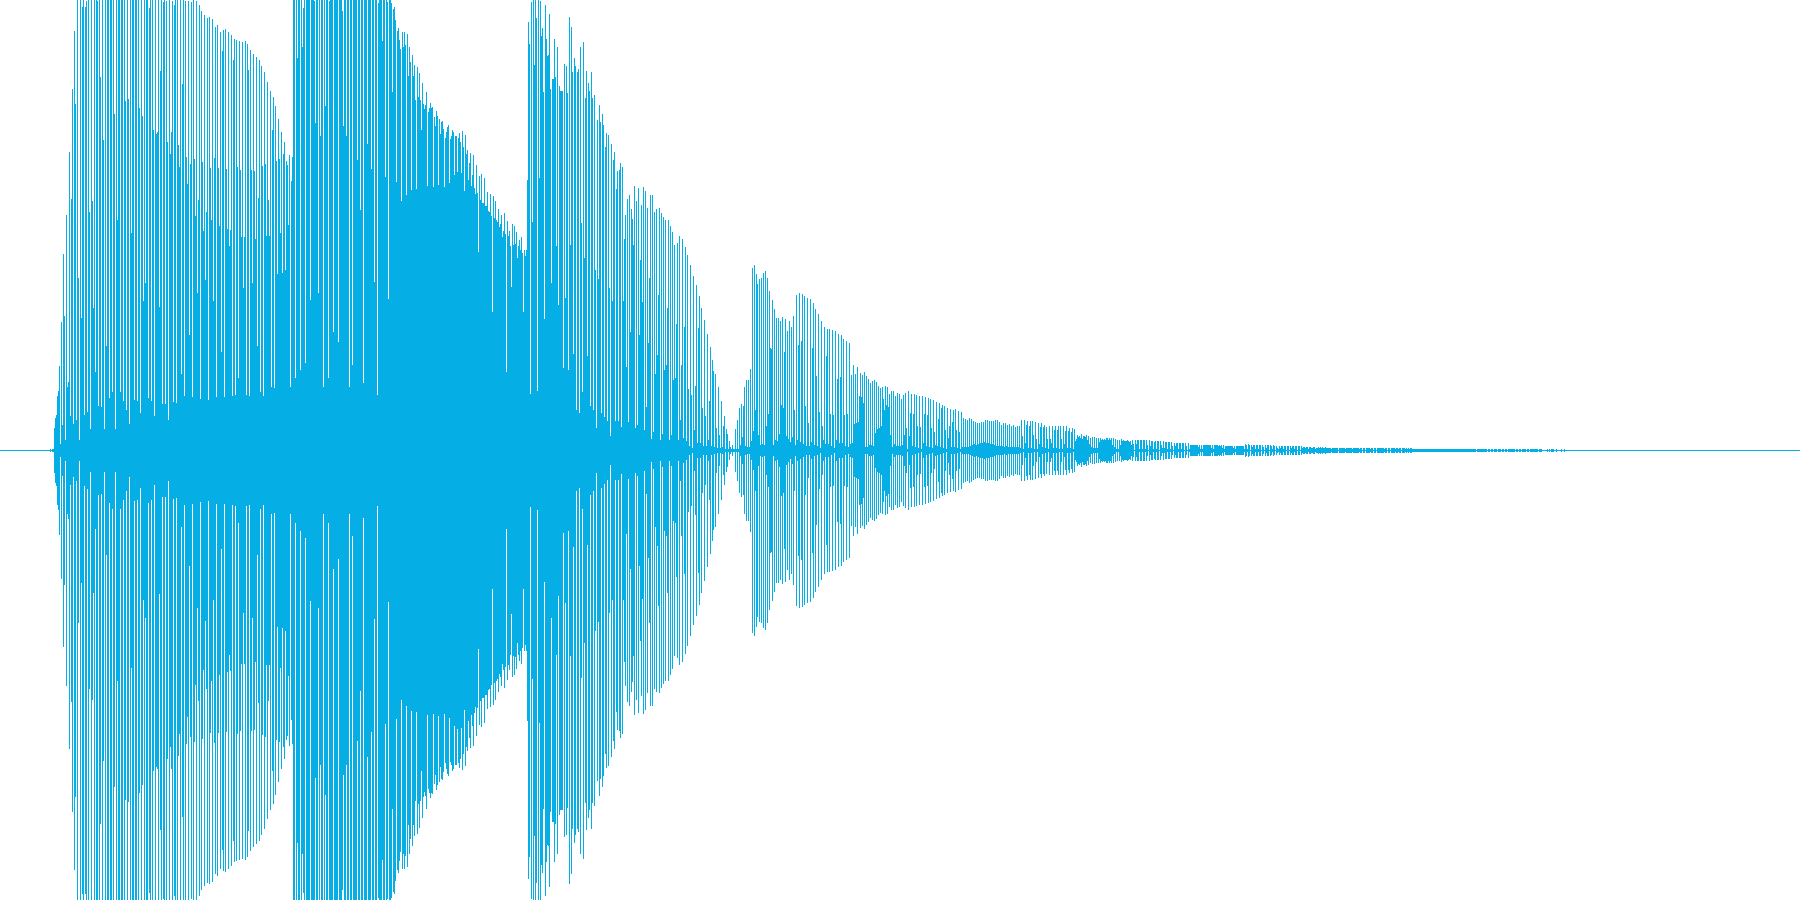 8bit音源による魔法1の再生済みの波形